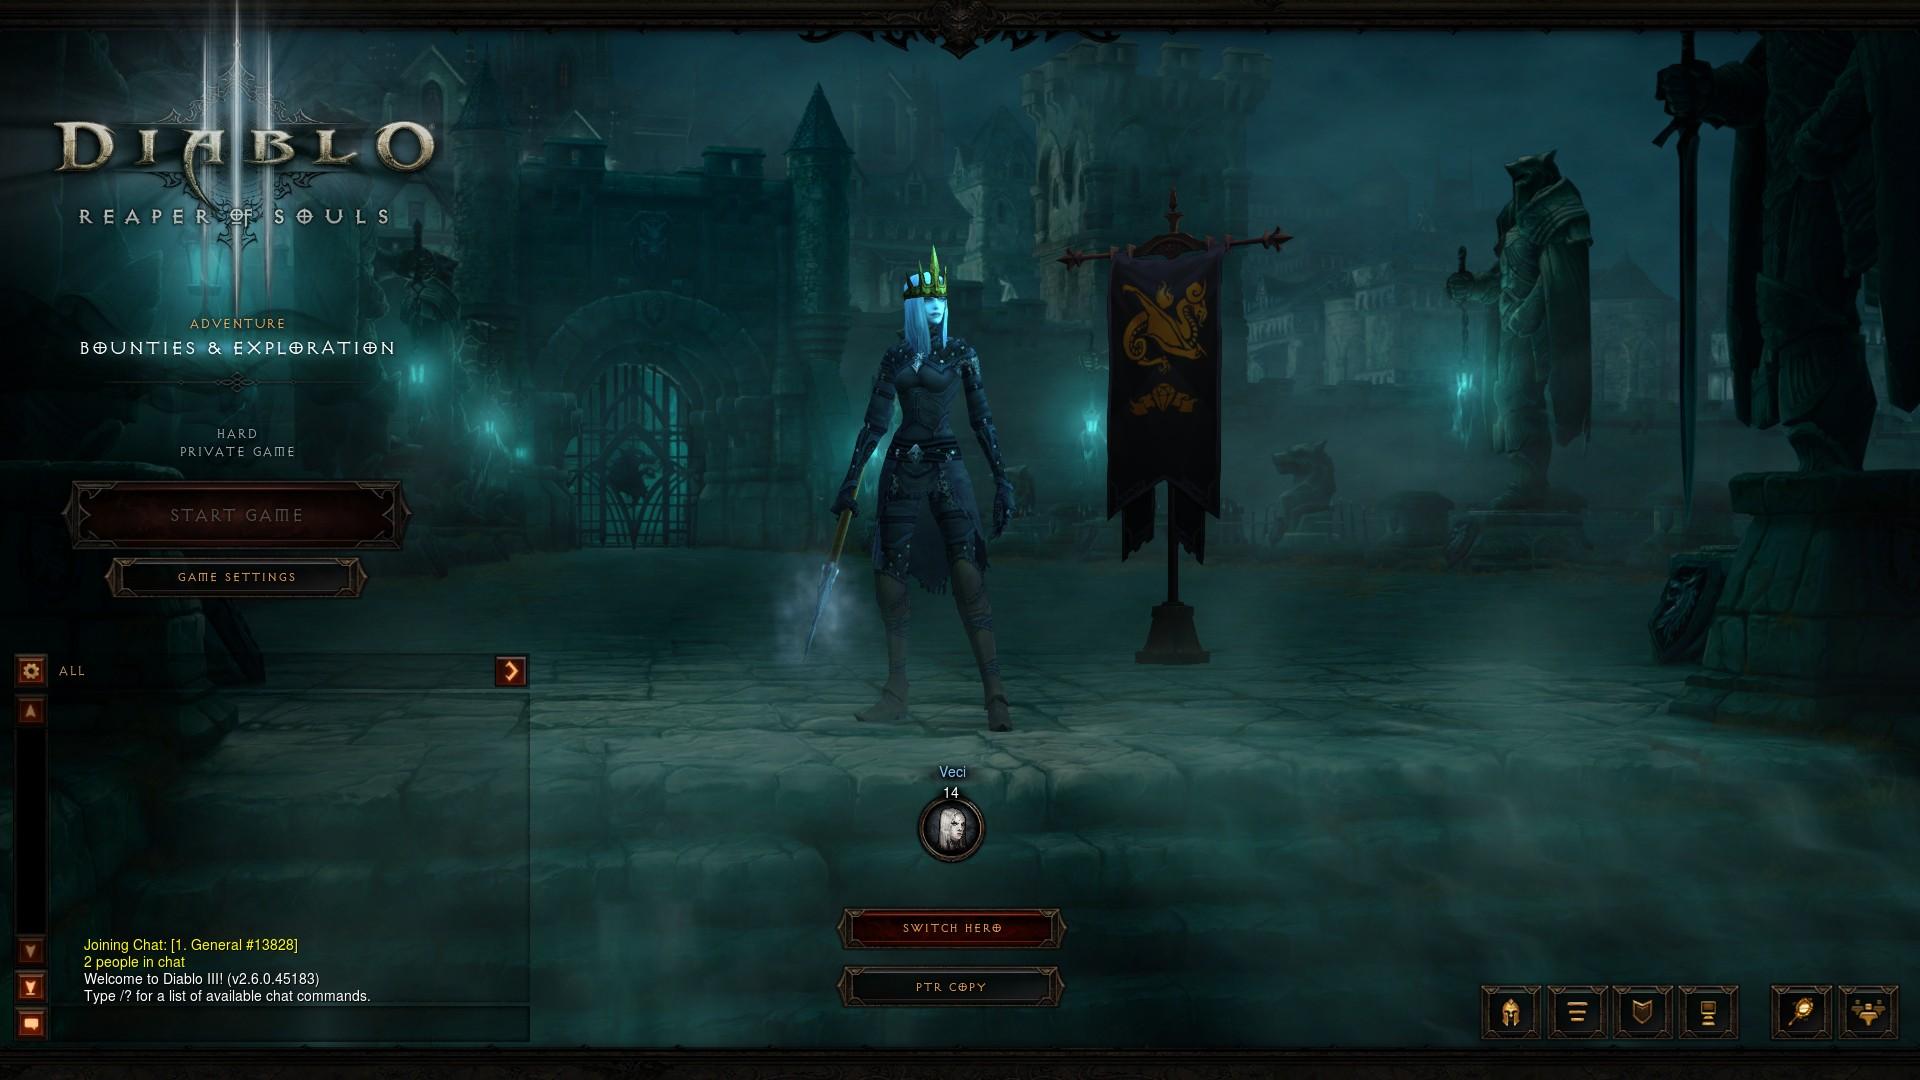 Diablo III Necromancer First Impressions: A Versatile Class